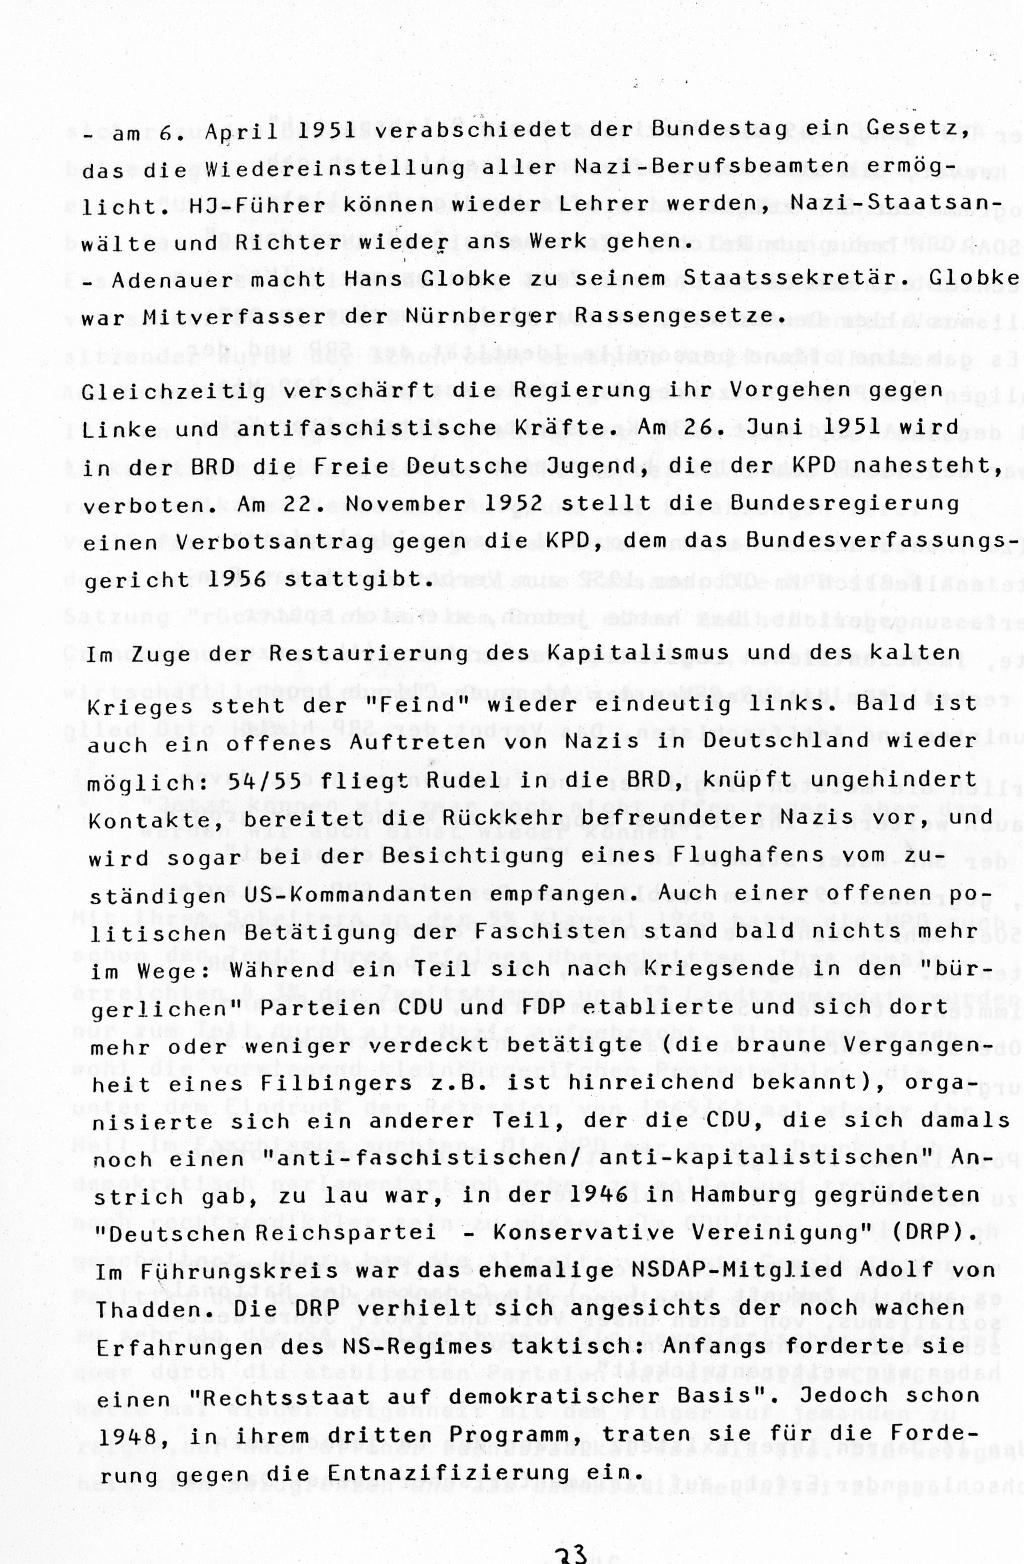 Berlin_1983_Autonome_Gruppen_Faschismus_im_Kapitalismus_23